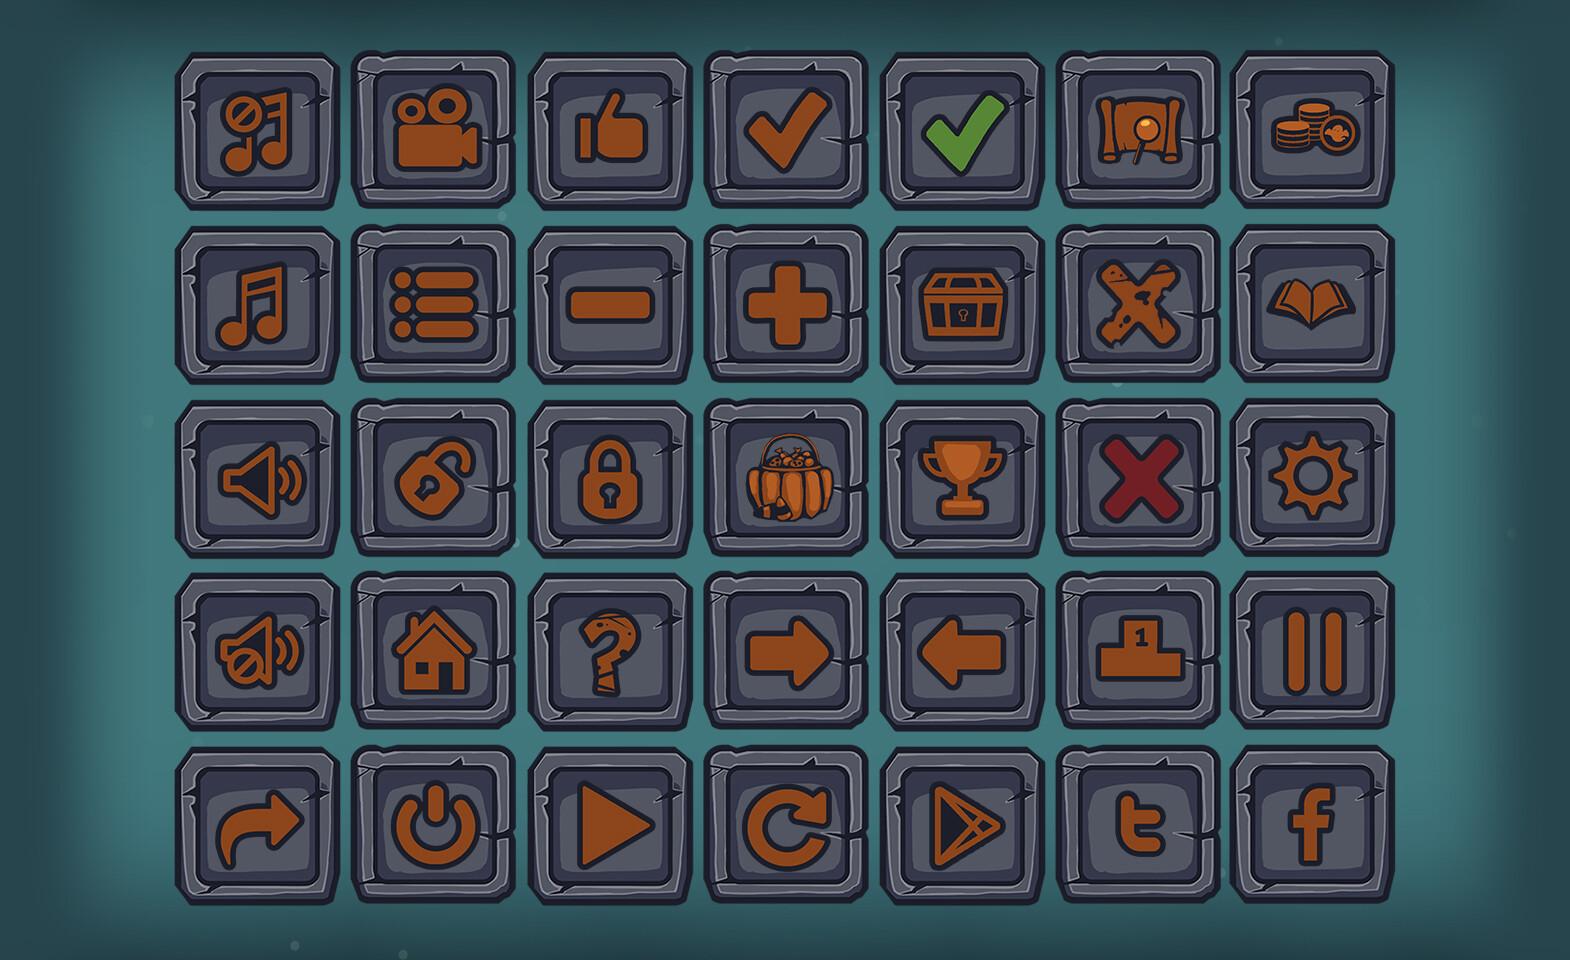 UI Buttons #2